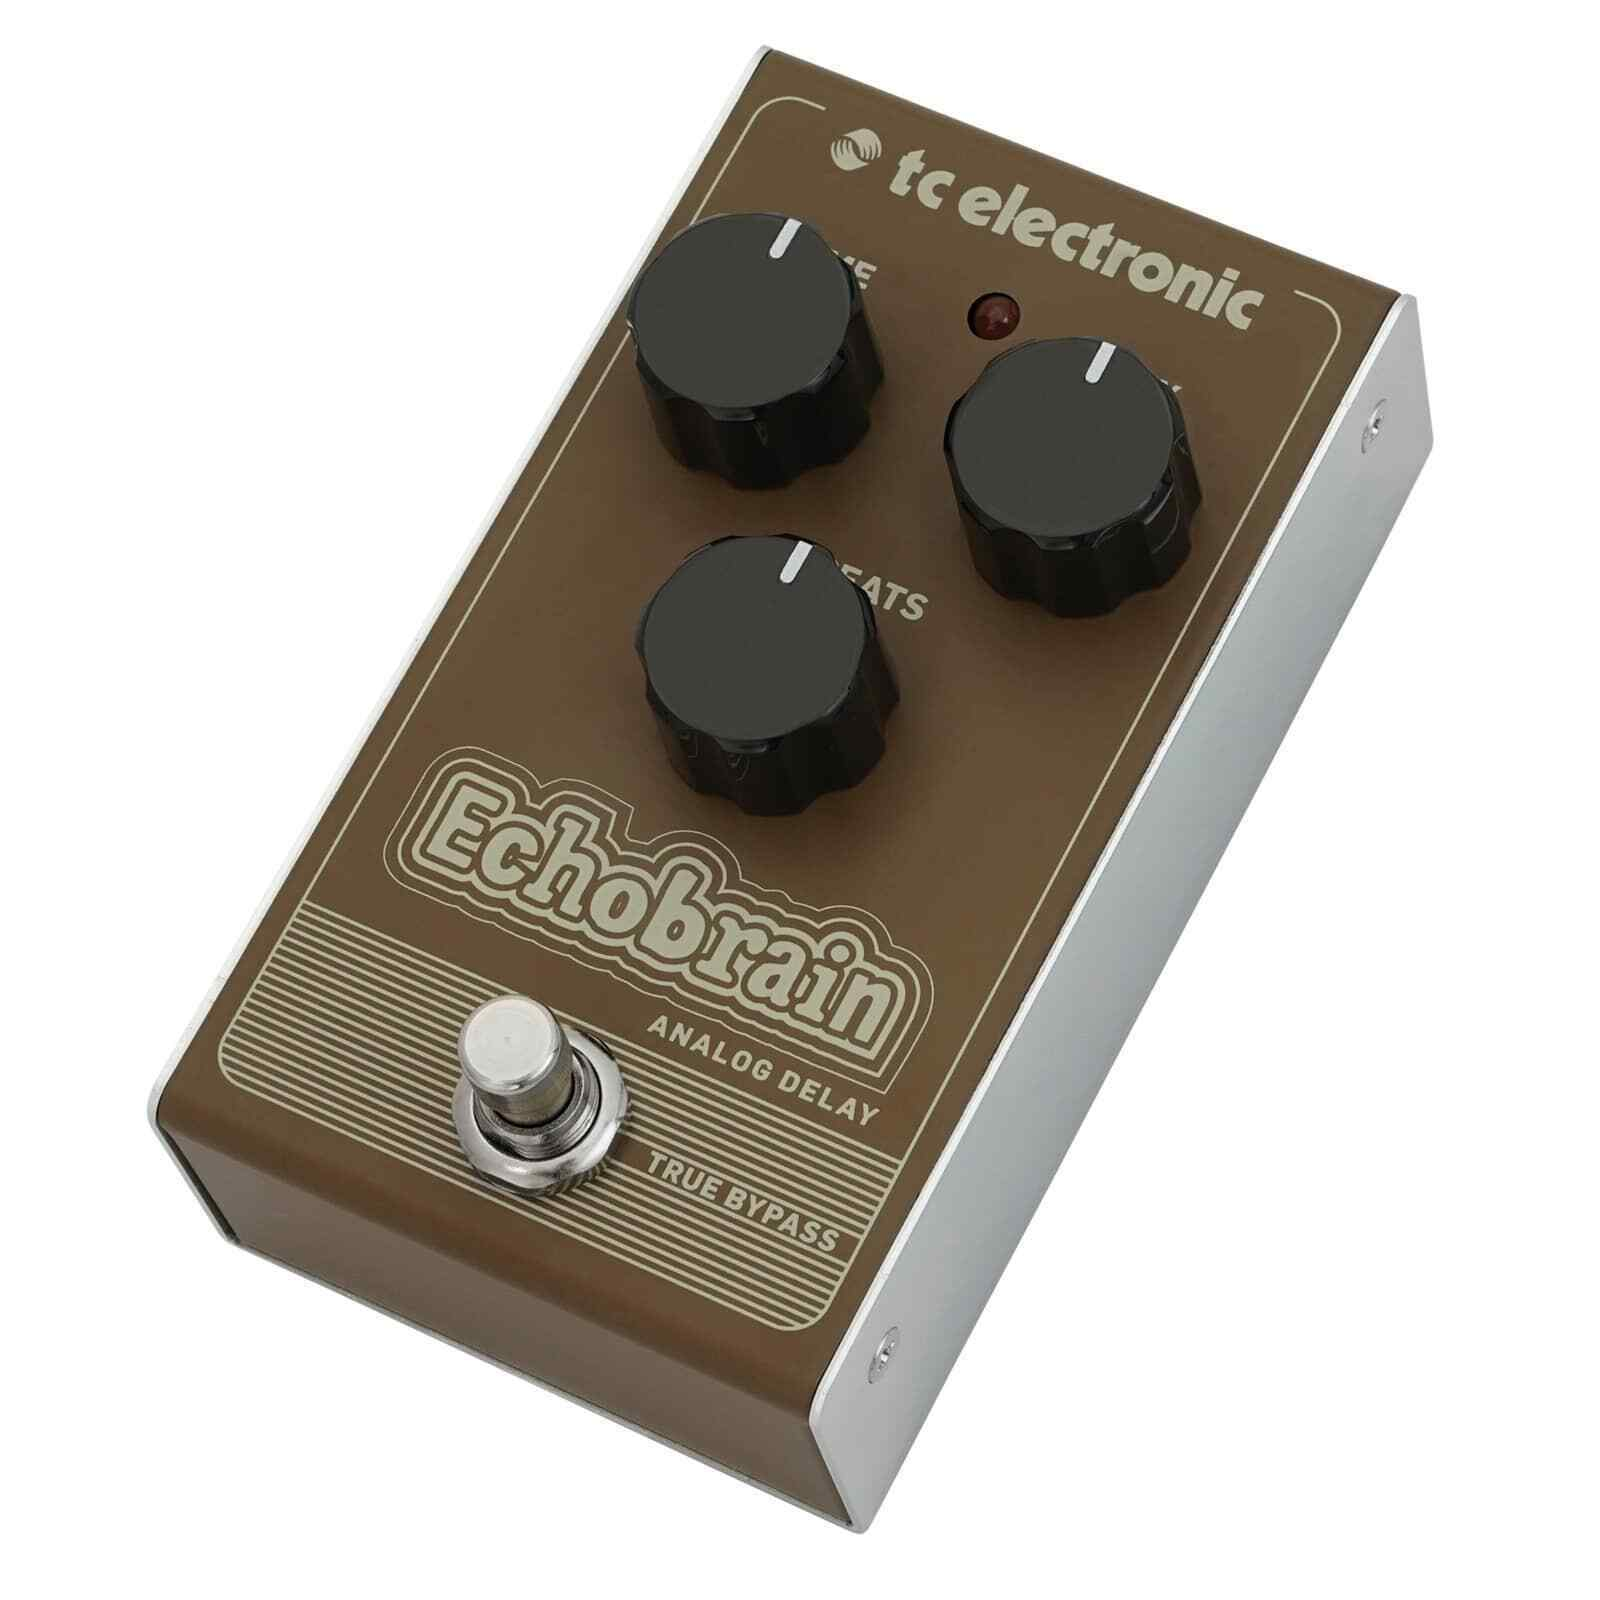 TC Electronic Echobrain Analog Delay Guitar Pedal